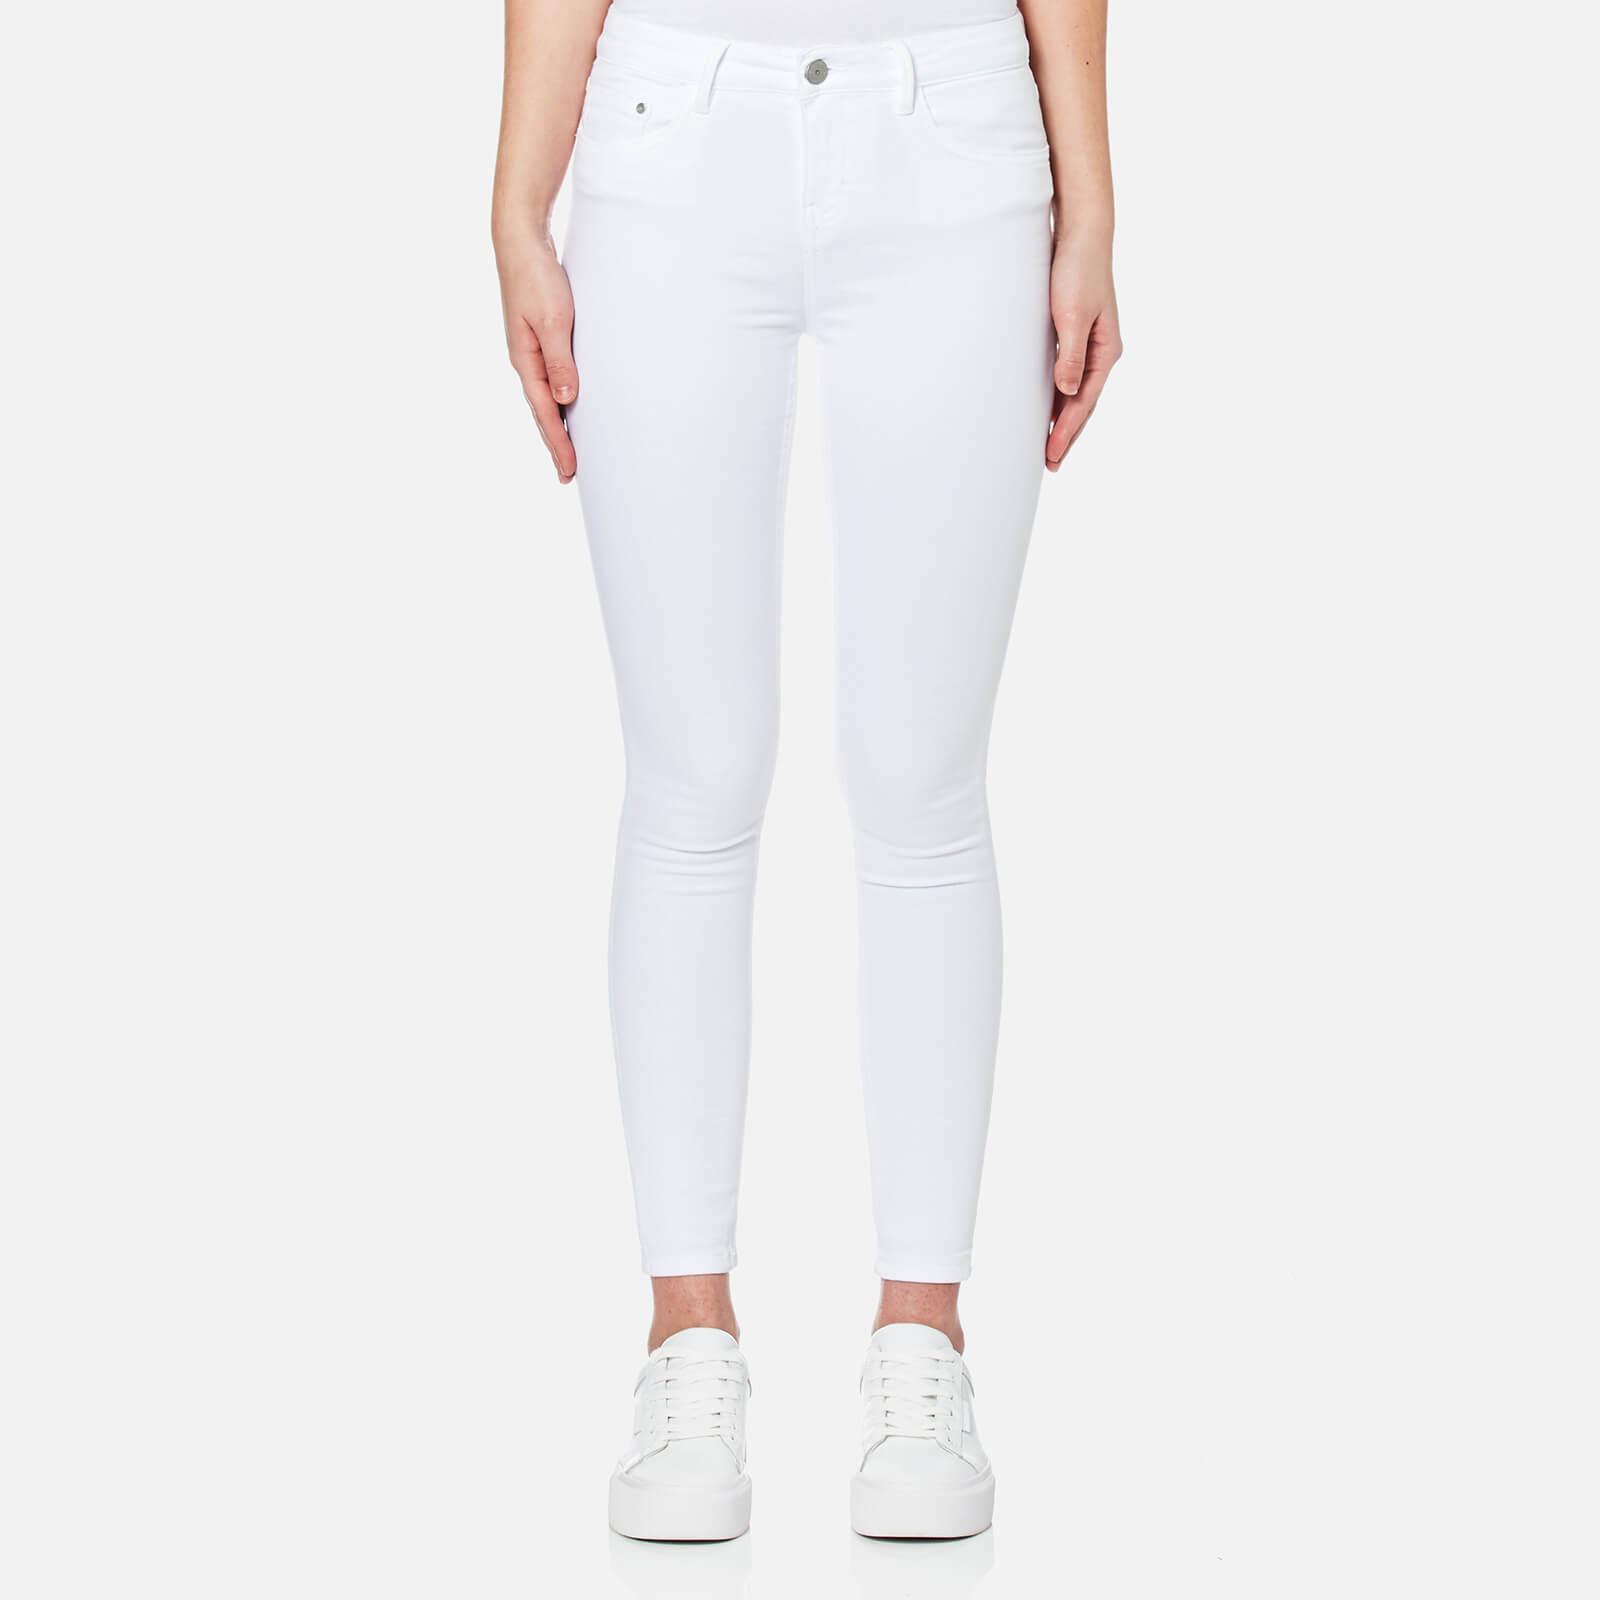 Waven Women's Freya Classic Skinny Ankle Grazer Jeans - White - UK 6 - White